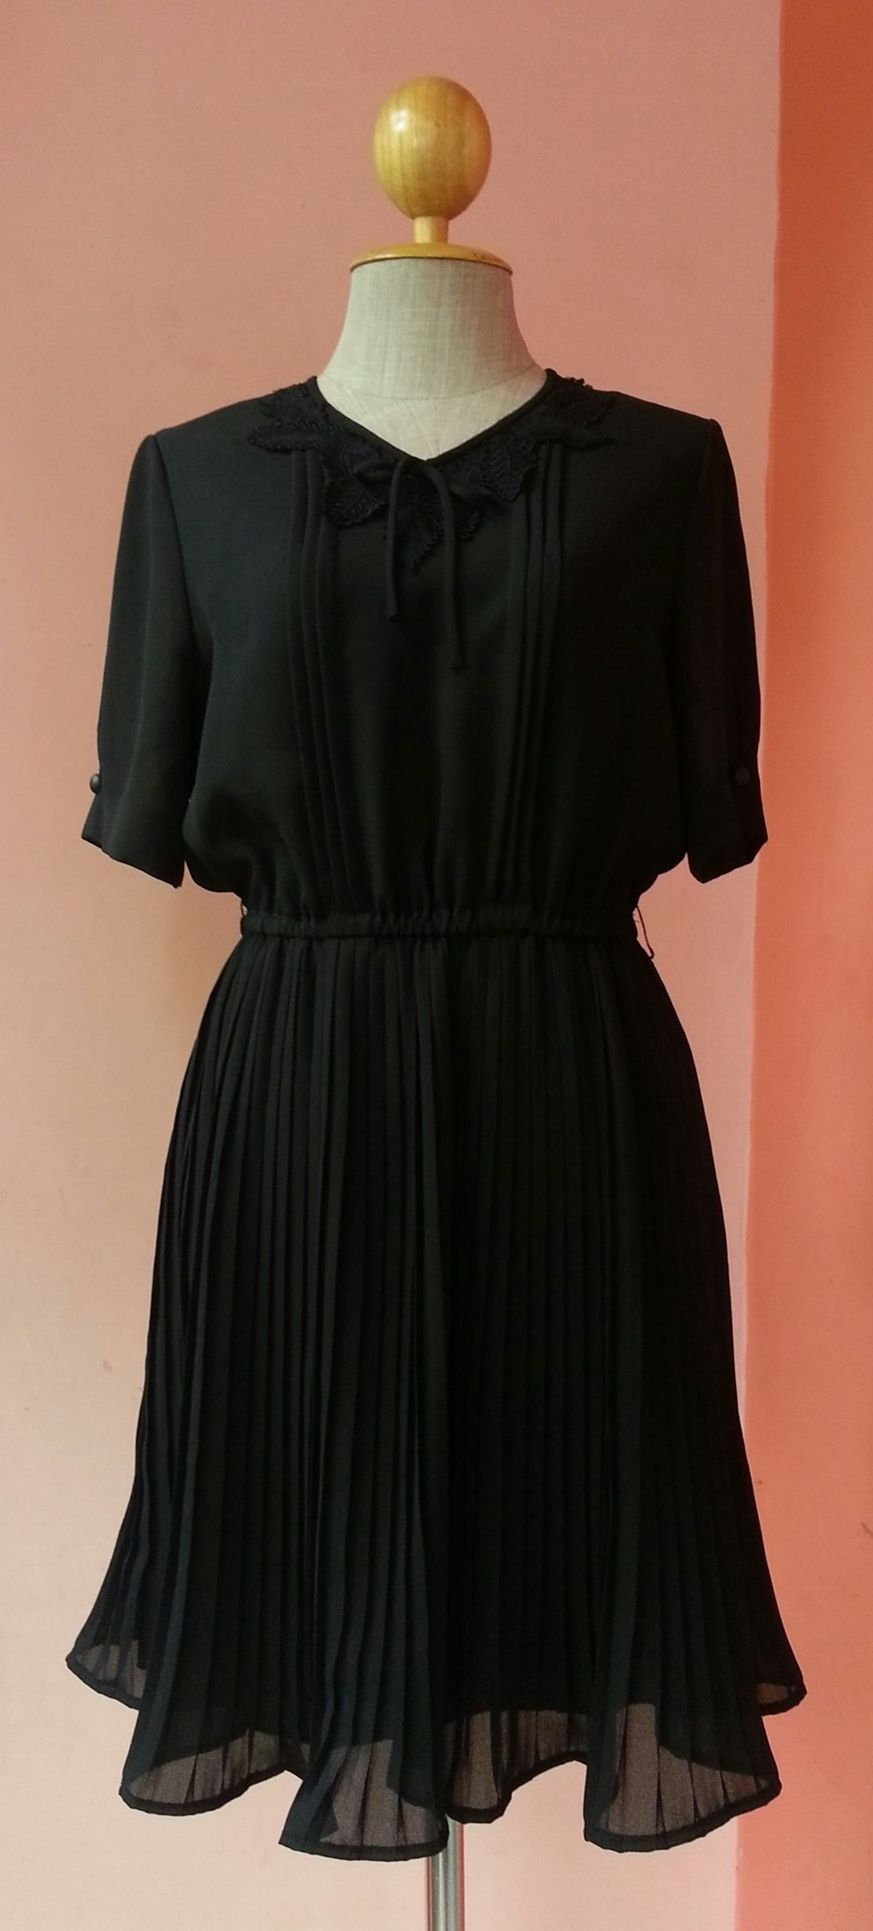 Black Dress 80s Prom Dress Vintage Party Dress 1980s Dress Women ...